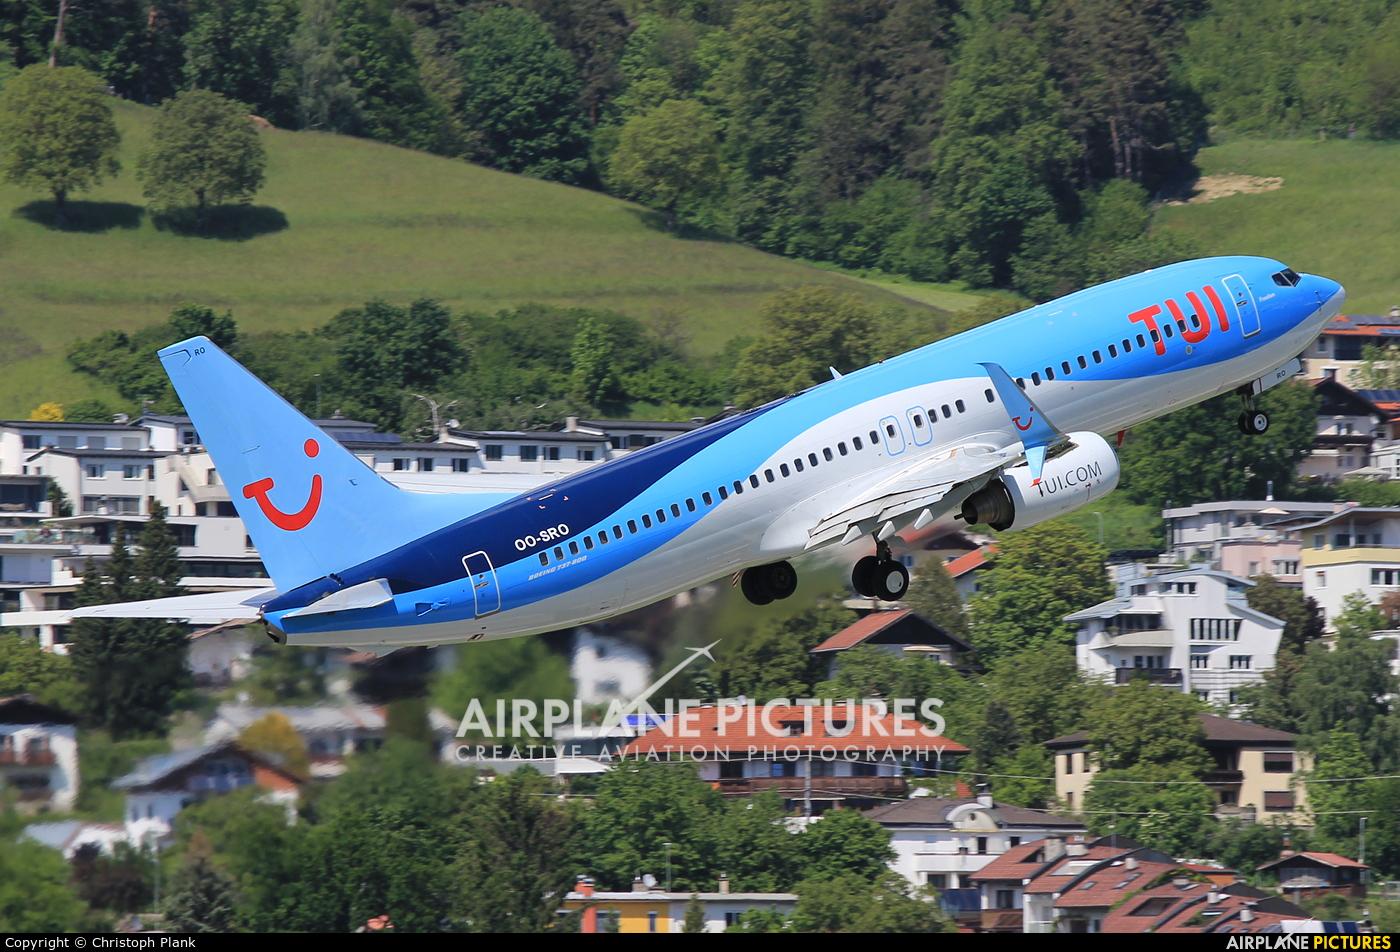 TUI Airlines Belgium OO-SRO aircraft at Innsbruck